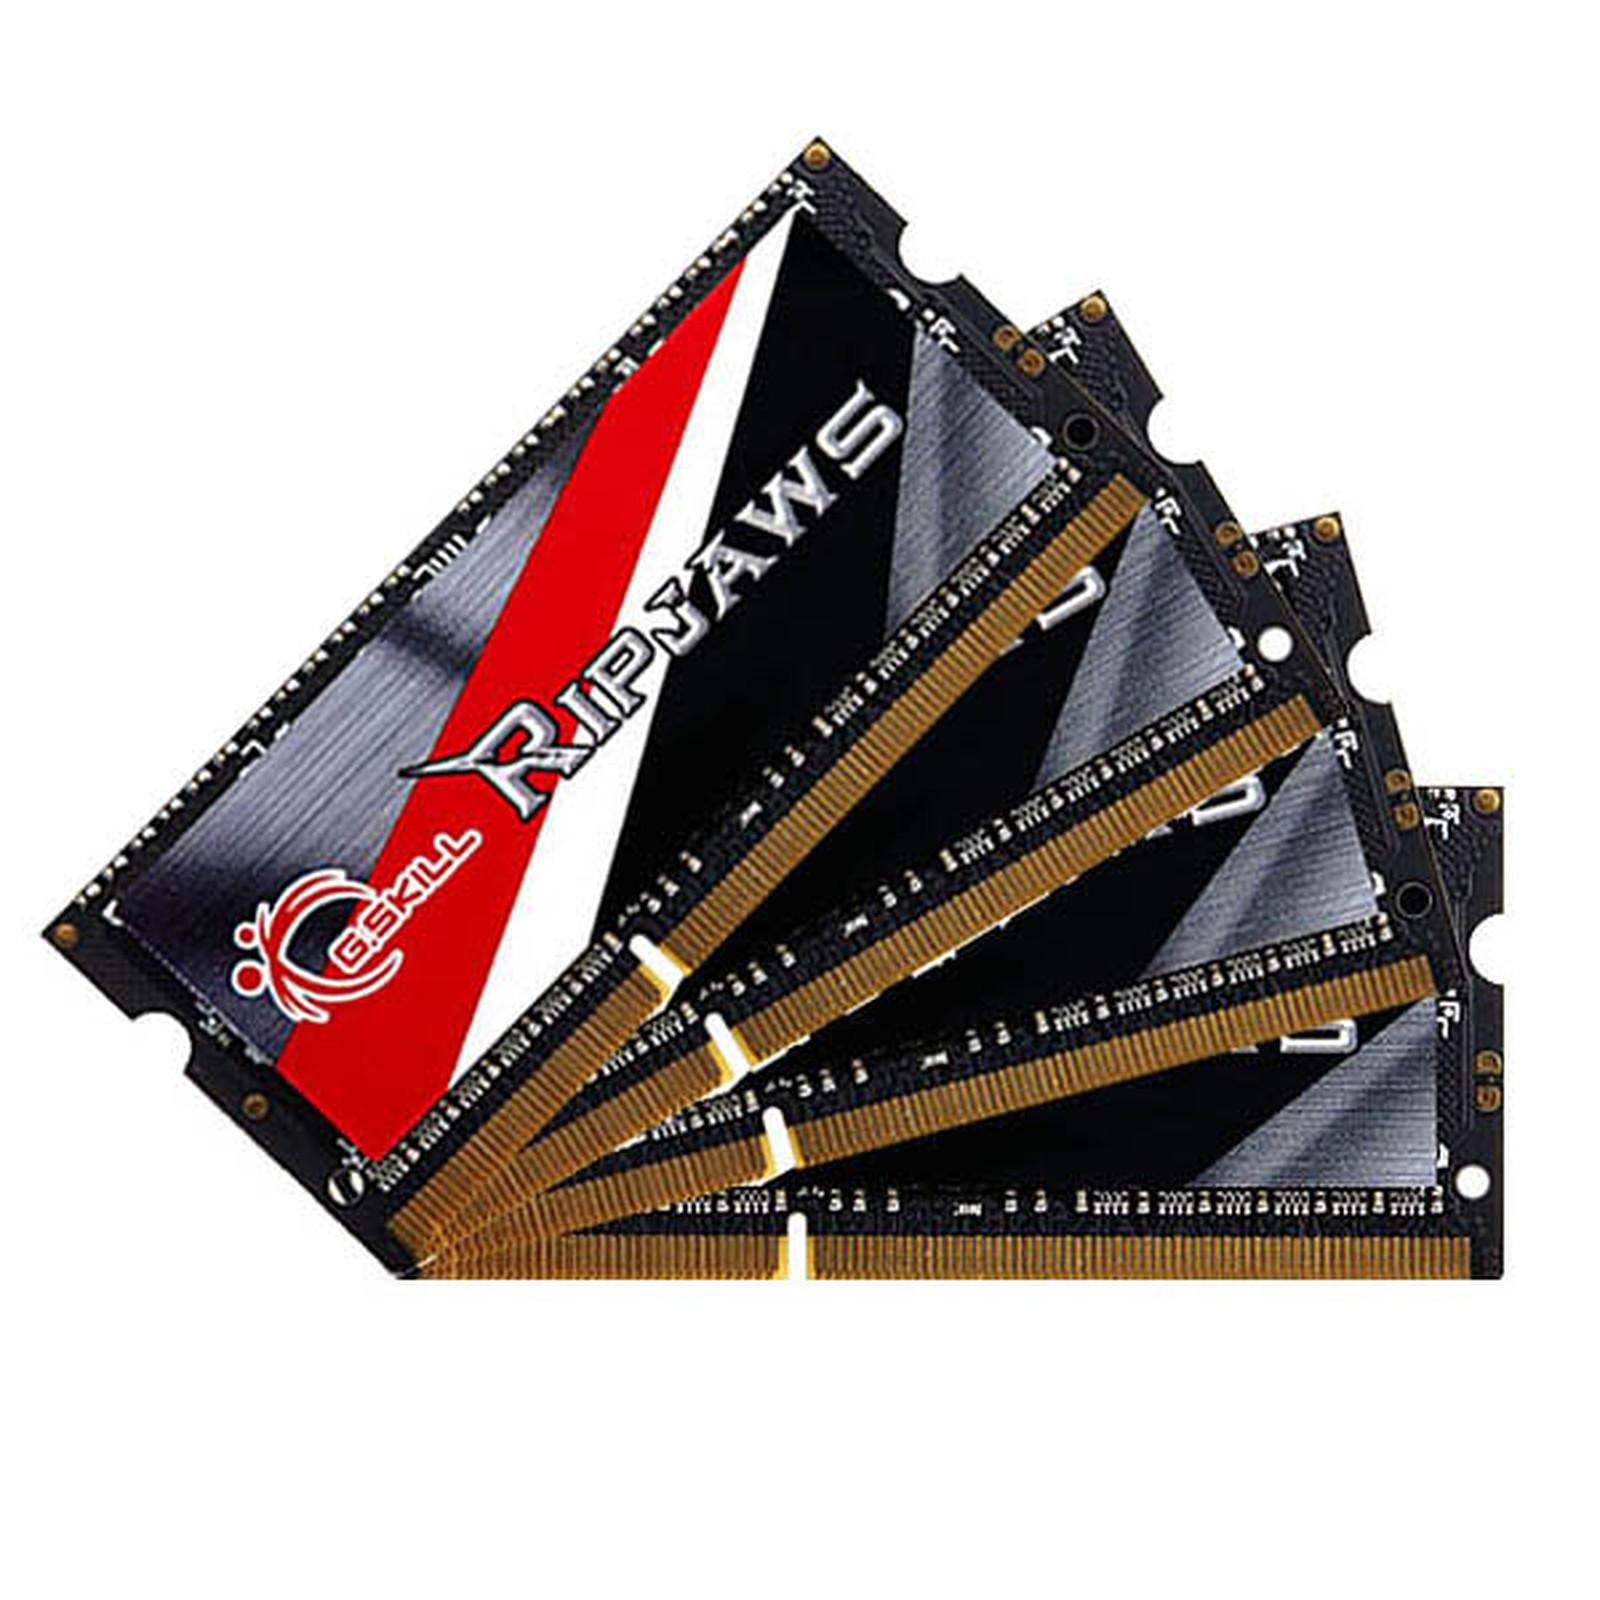 G.Skill RipJaws Series SO-DIMM 32 Go (4 x 8 Go) DDR3 1600 MHz CL11